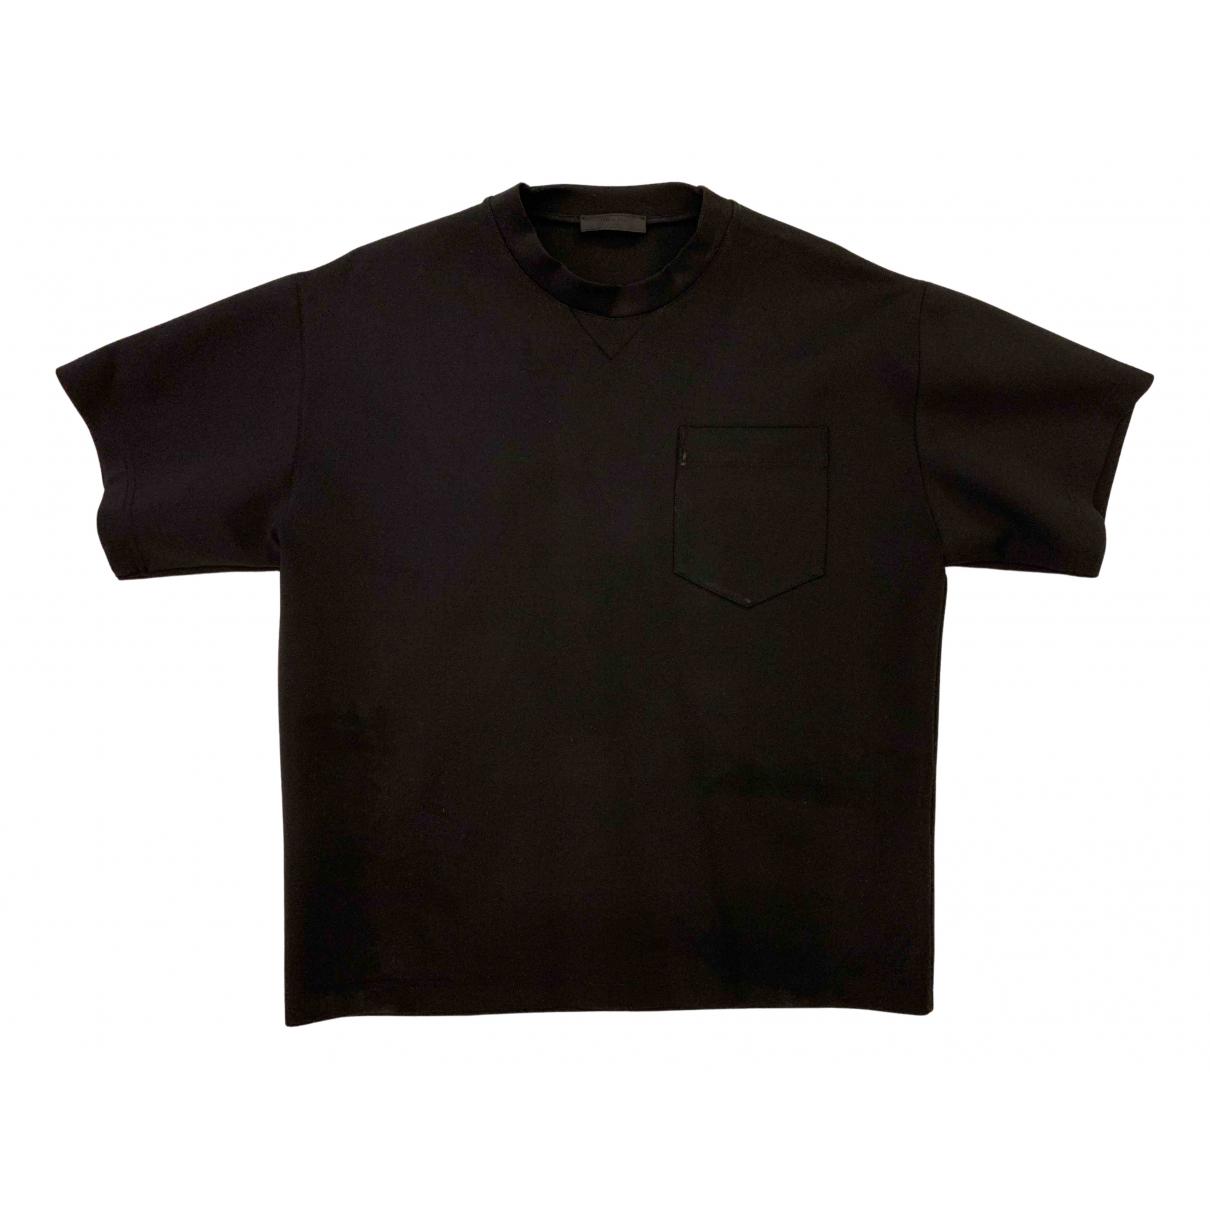 Prada - Tee shirts   pour homme - noir